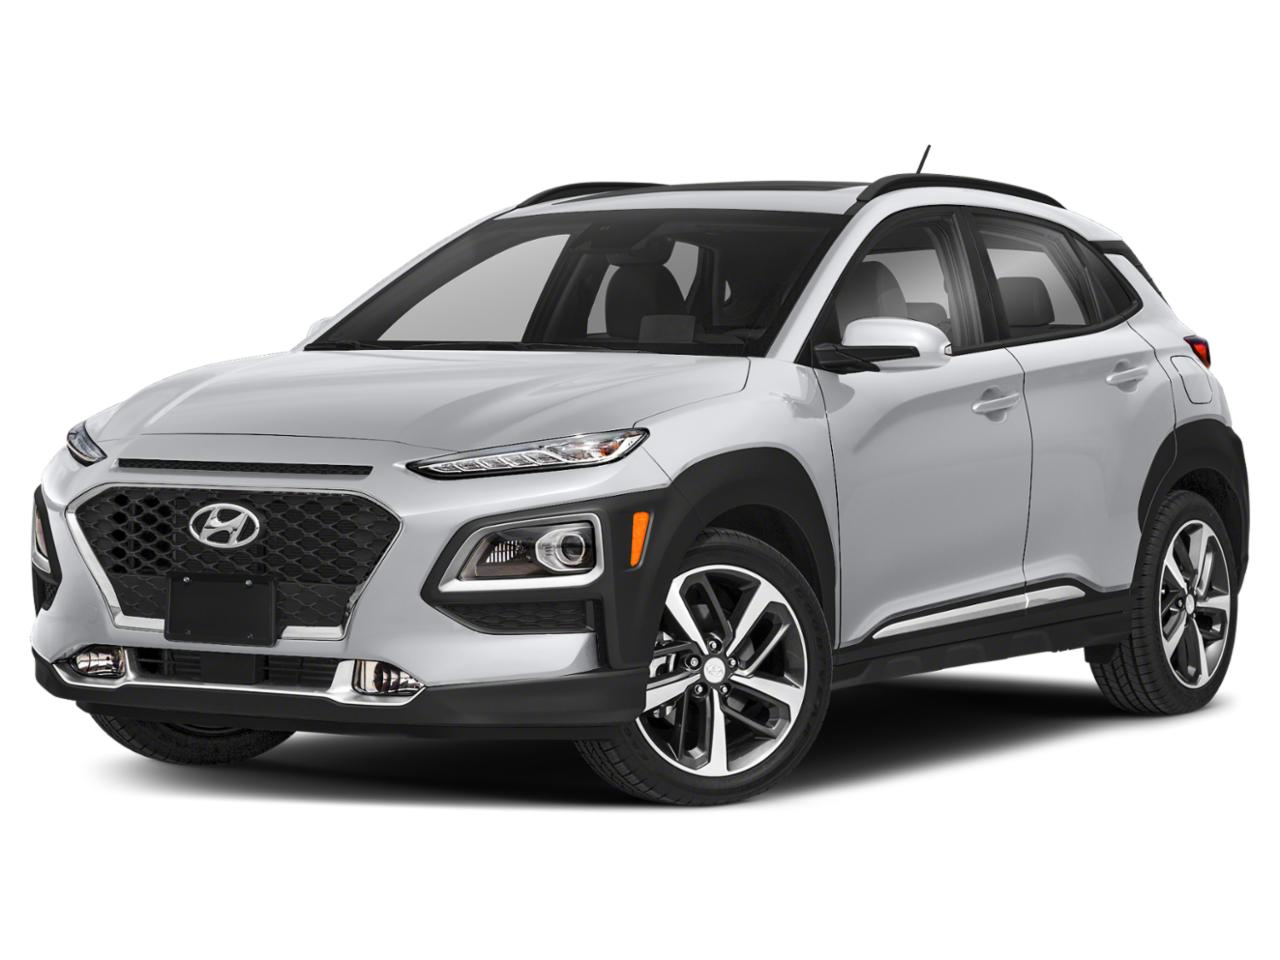 2020 Hyundai Kona Vehicle Photo in Longmont, CO 80501